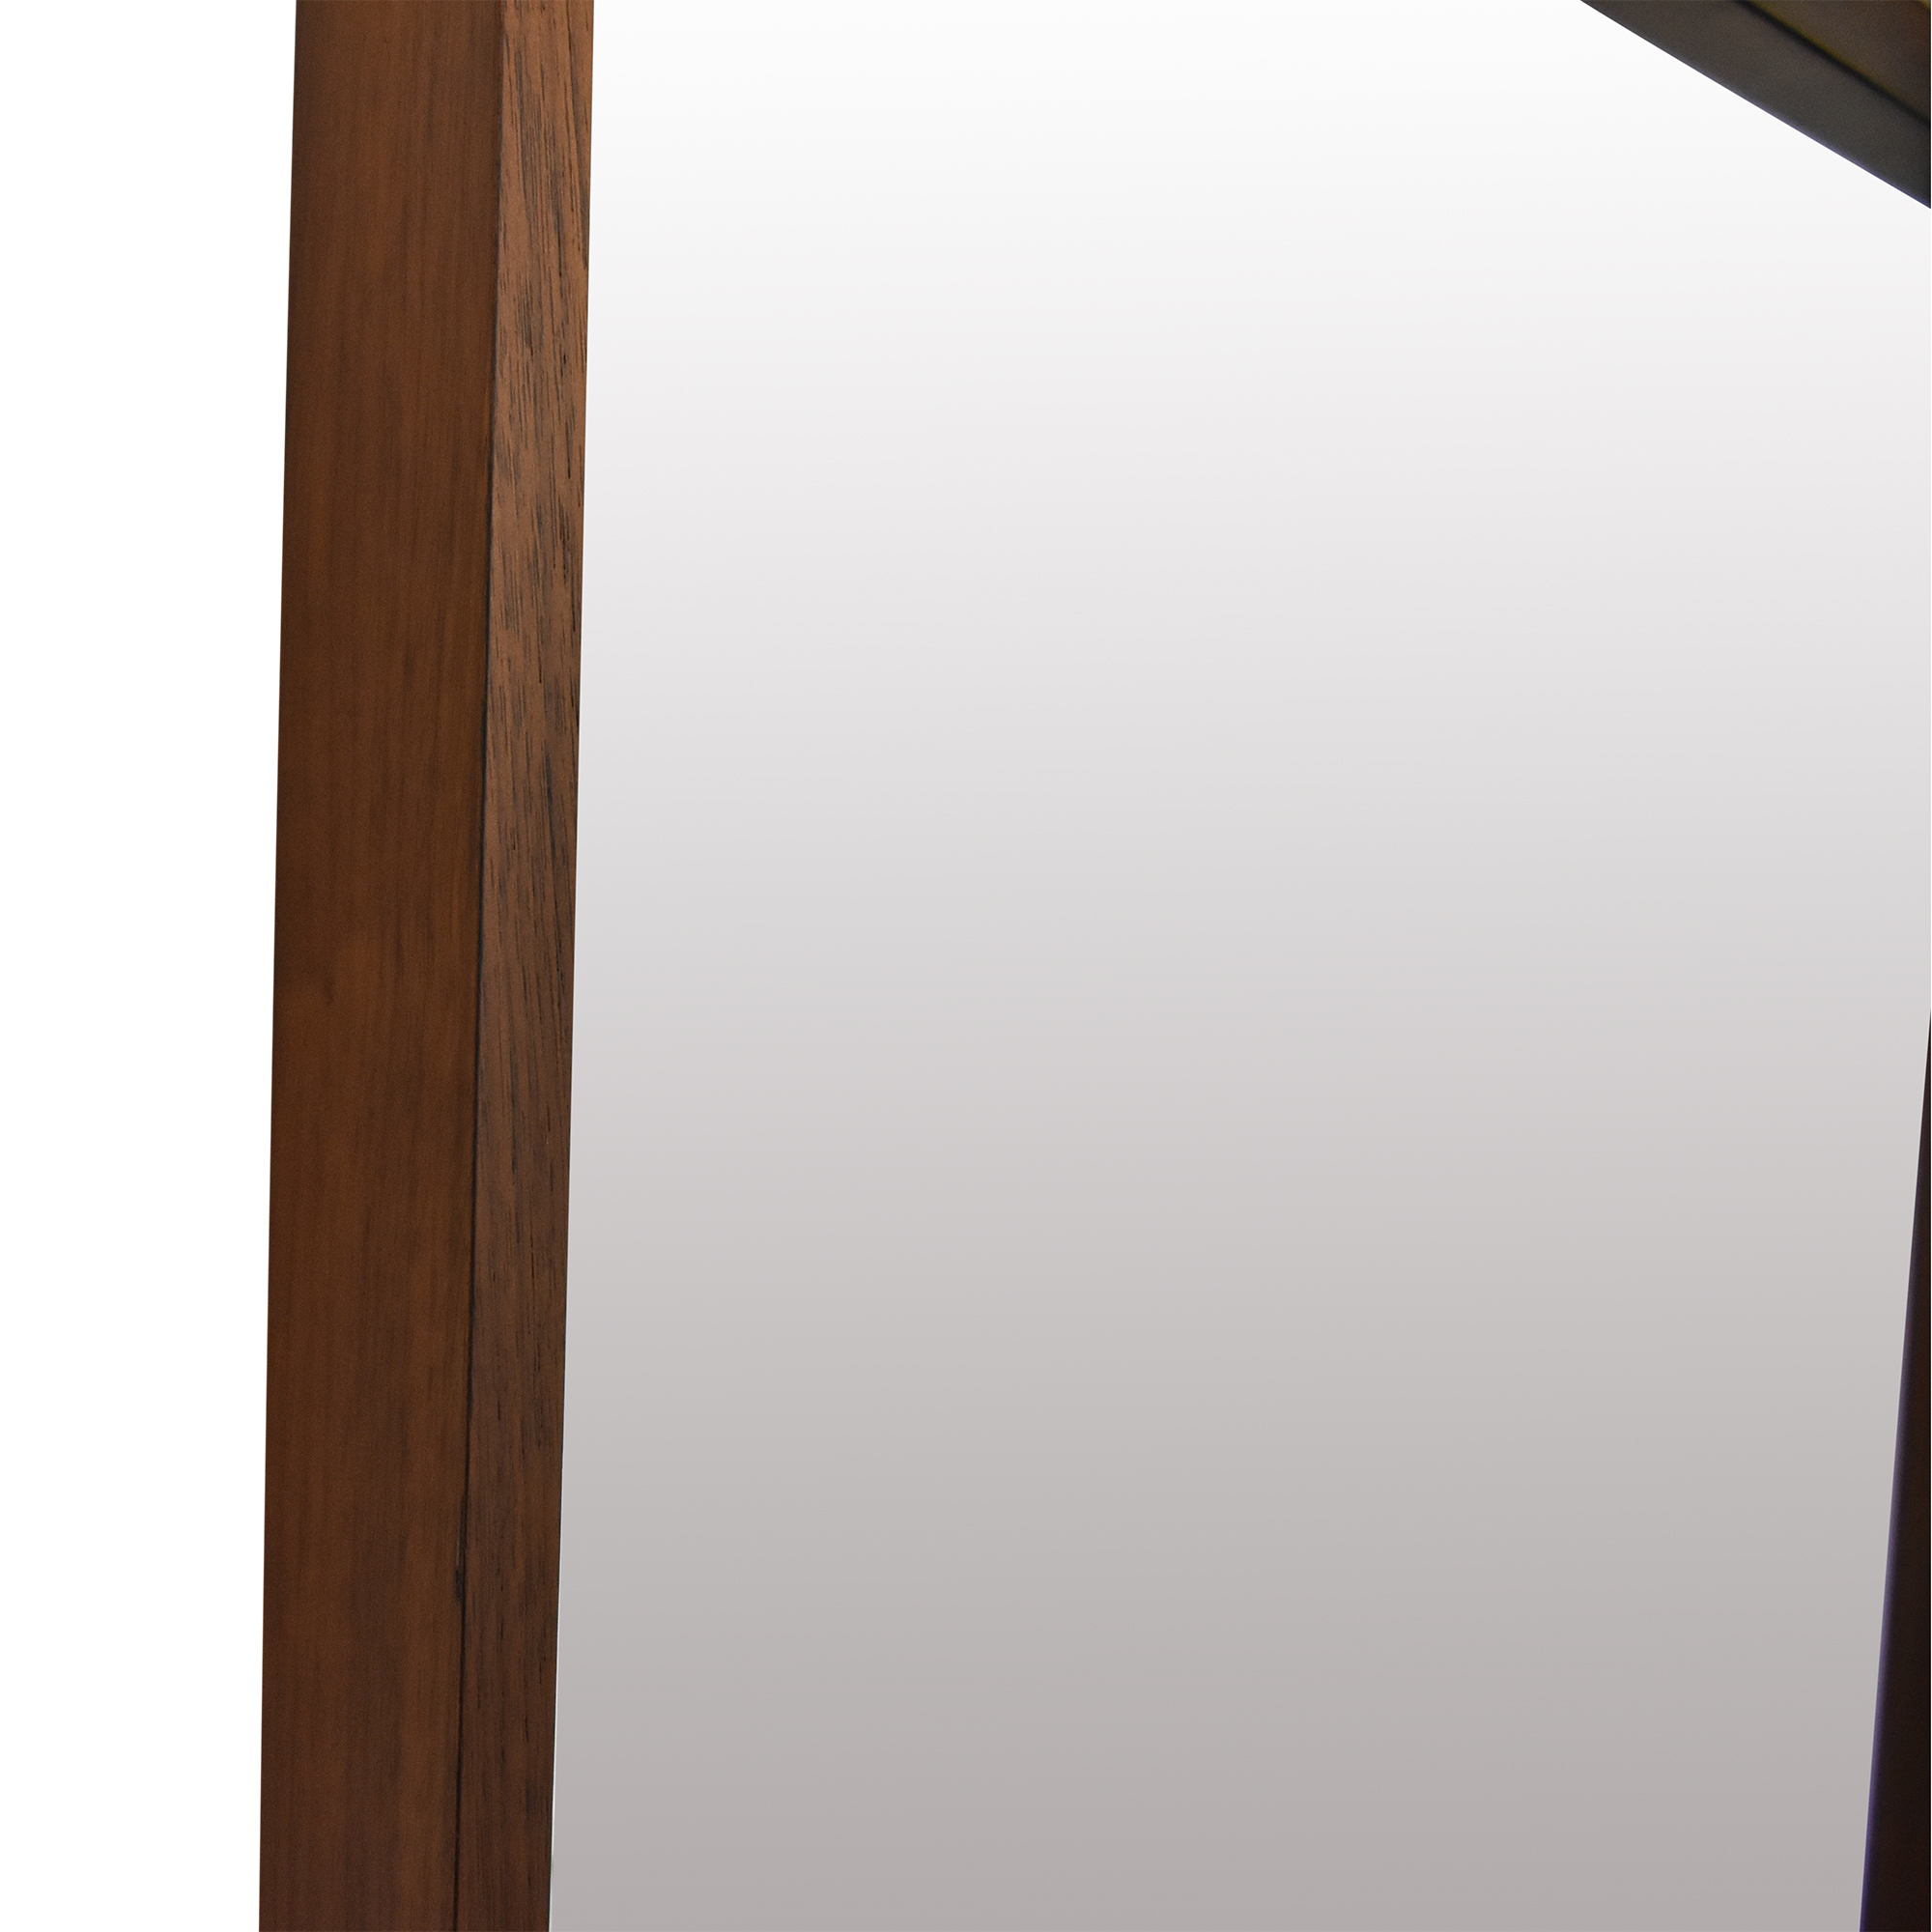 West Elm West Elm Malone Campaign Floor Mirror pa